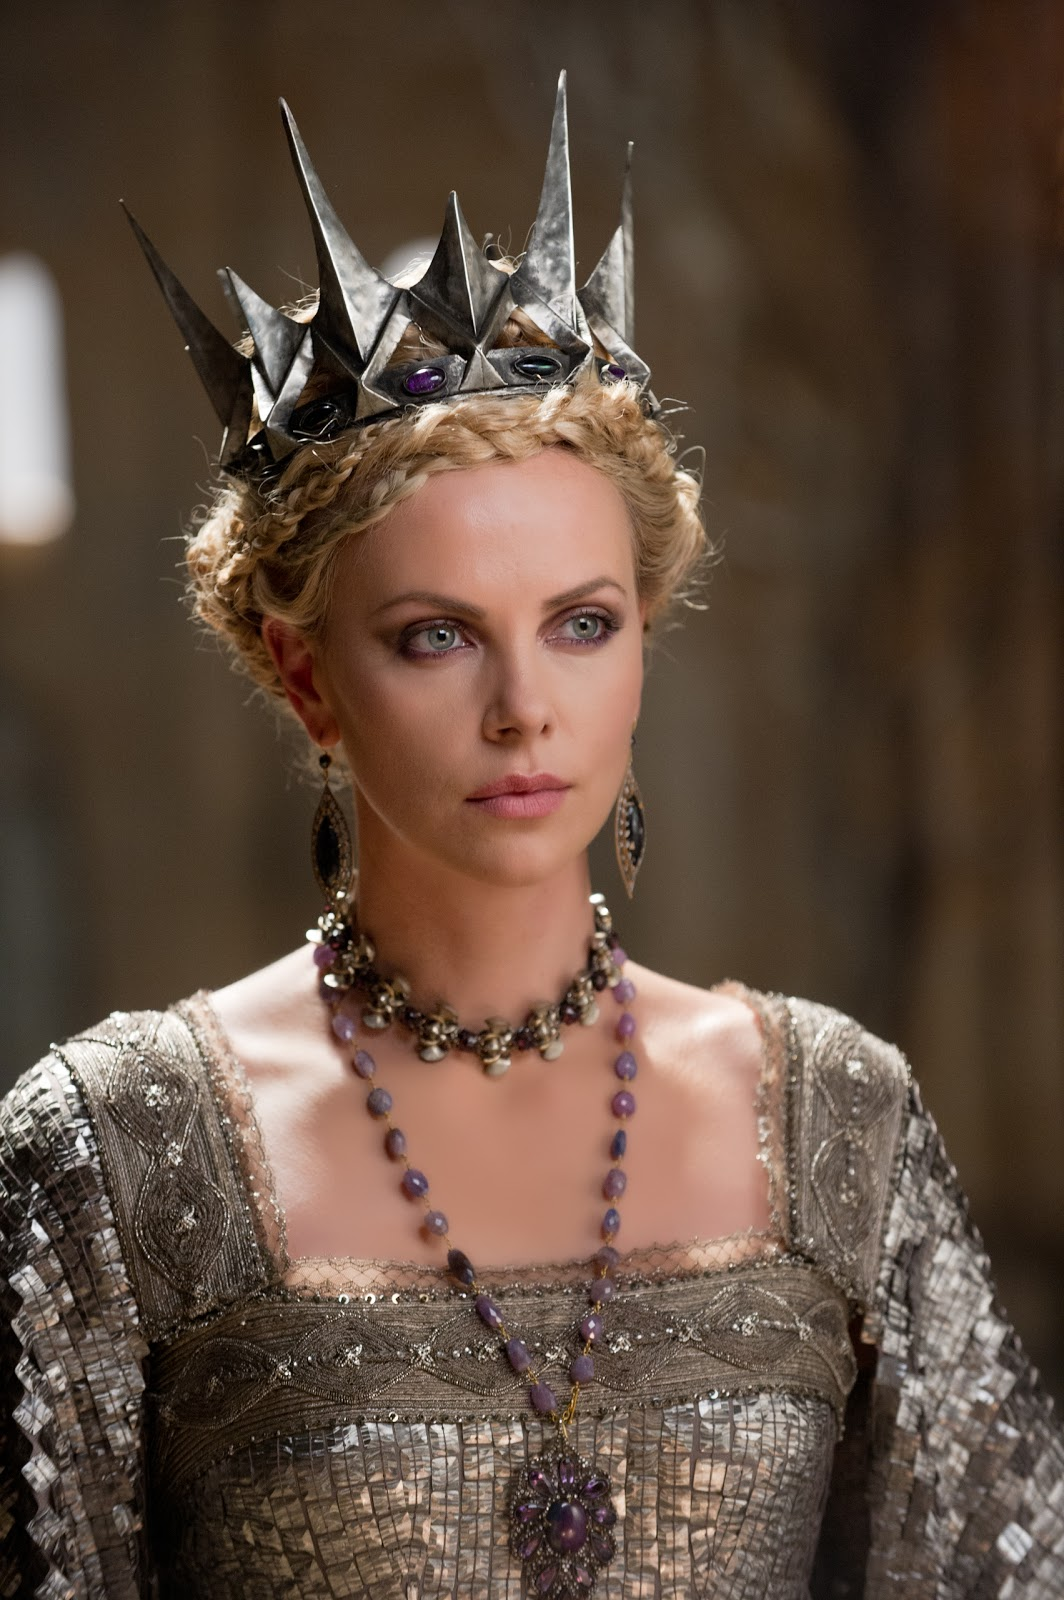 http://3.bp.blogspot.com/-94B4gW0zl_g/T9BTd9G6IHI/AAAAAAAAW4w/UJjh4EaC5Lg/s1600/2410_TP2F_00045R_charlize_theron_close_up_i\'m_the_queen_2.jpg